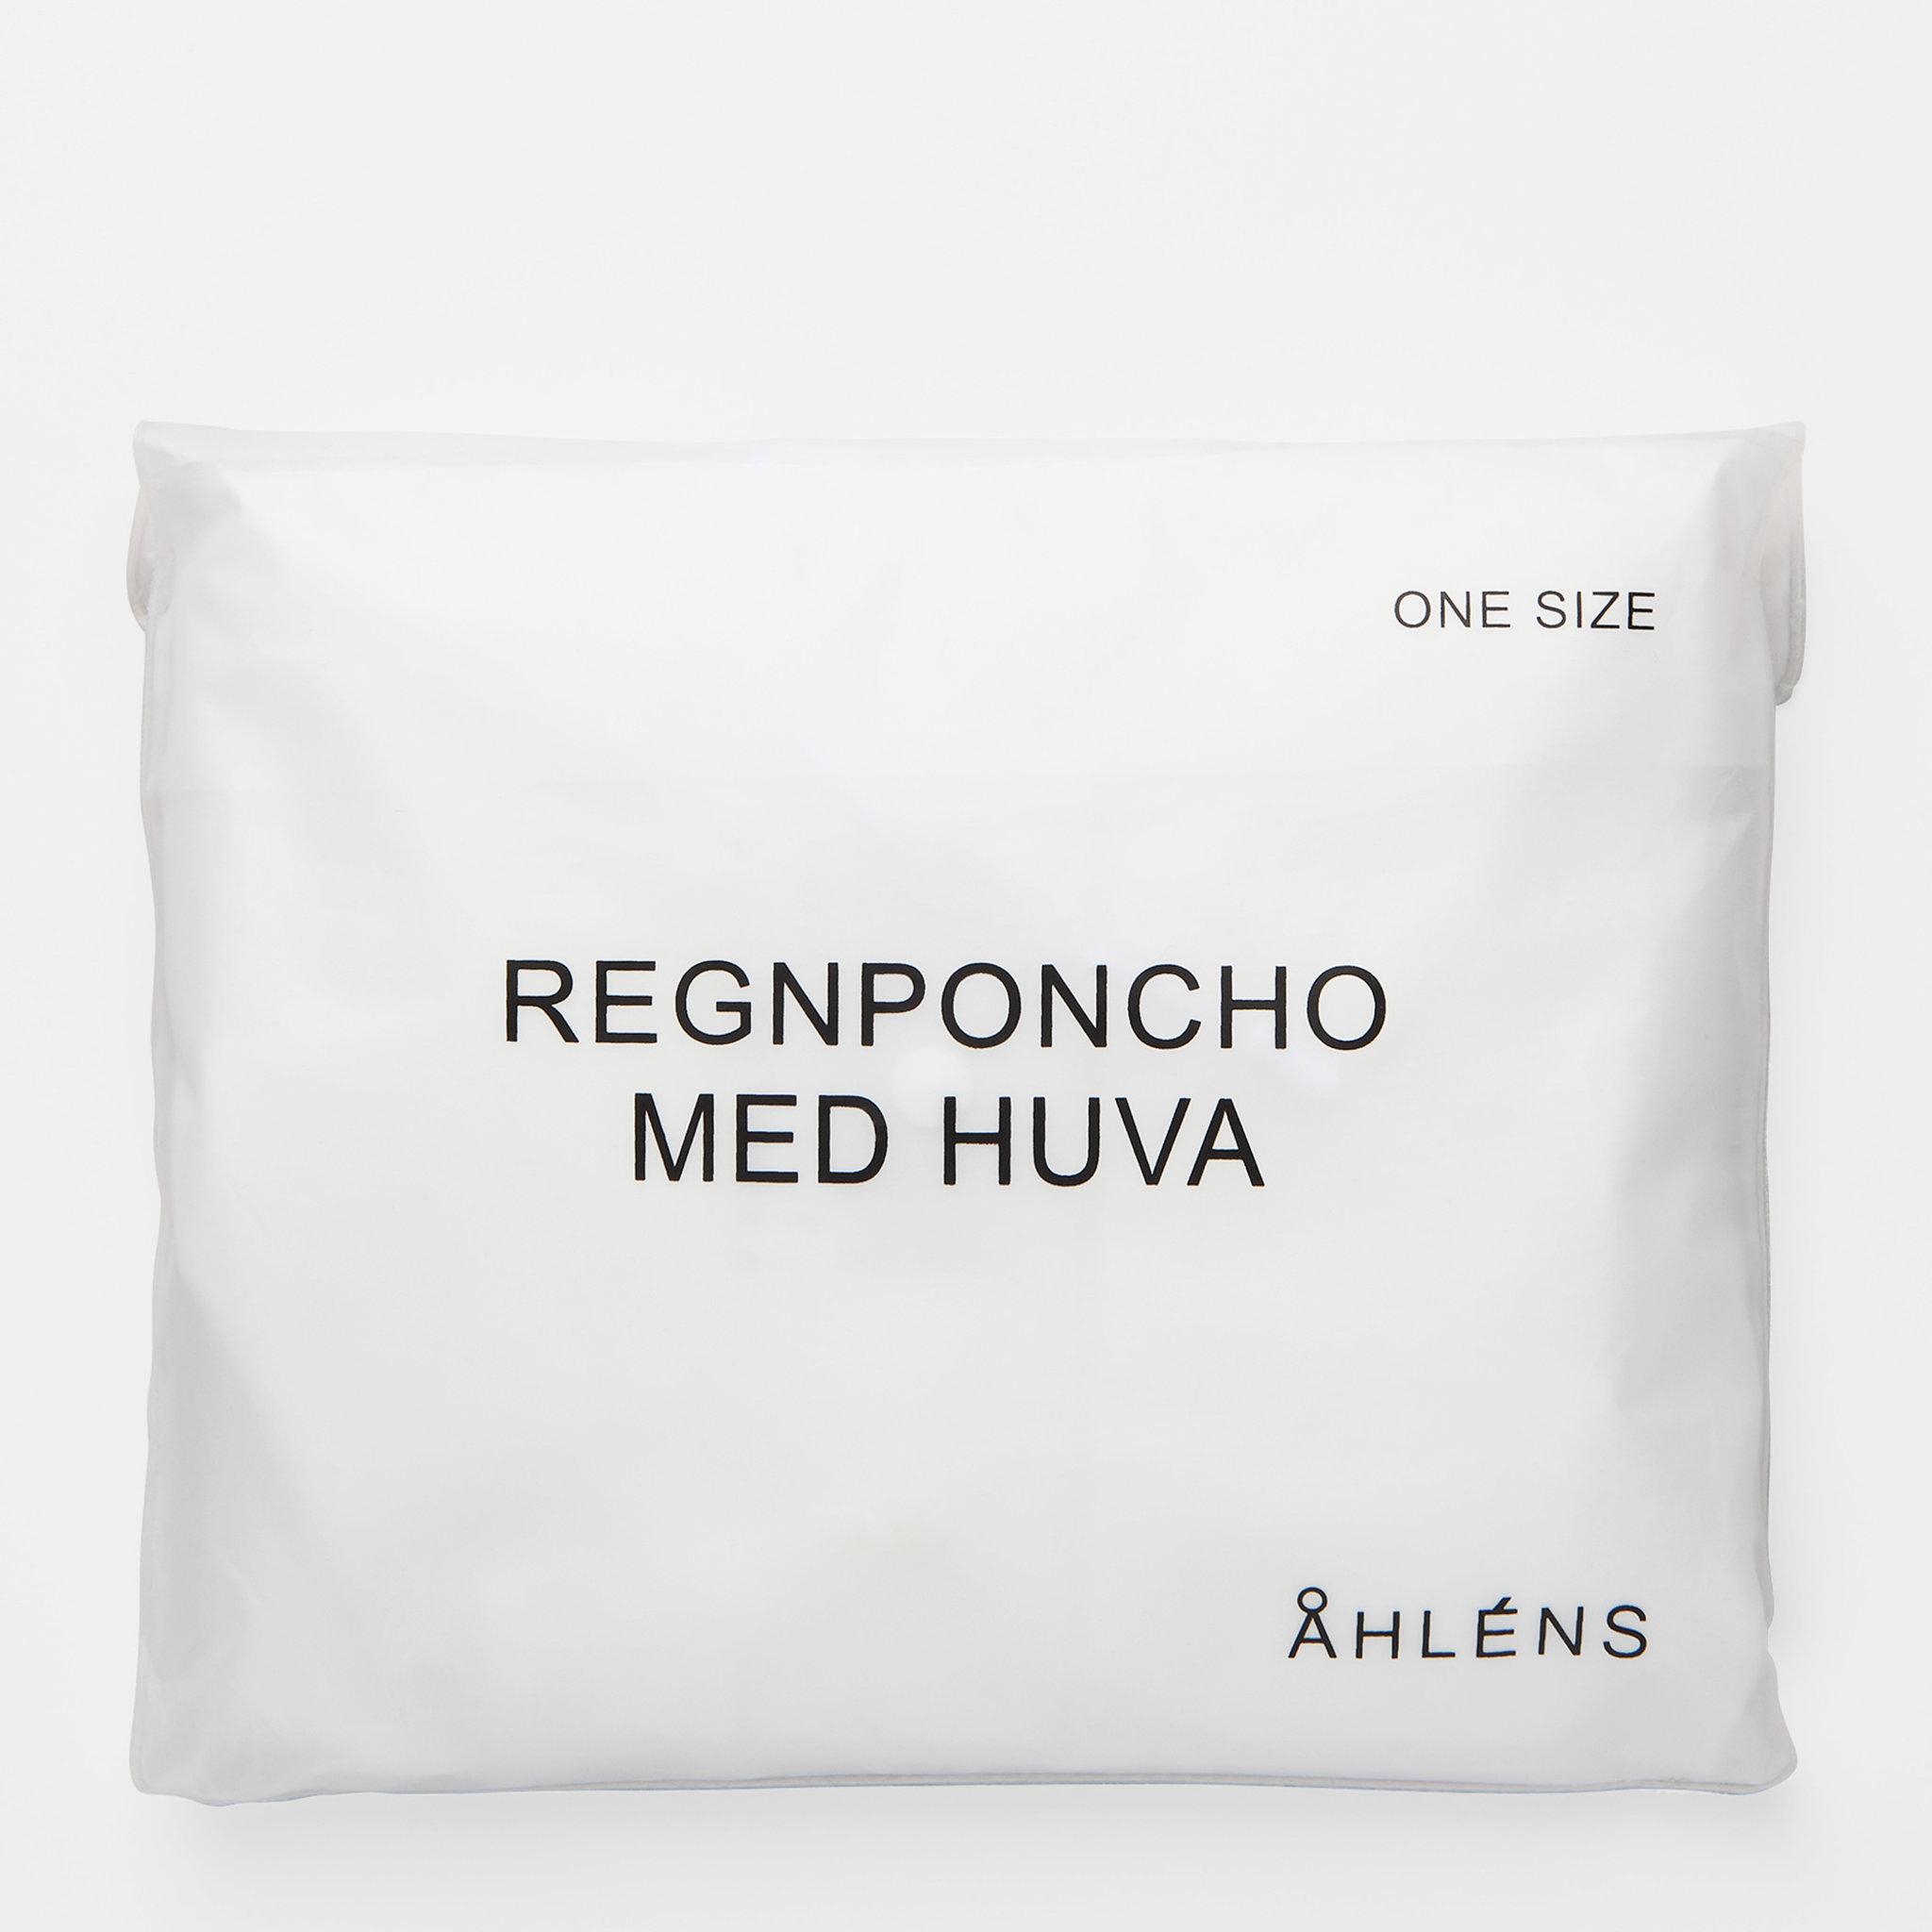 Regnponcho, ONE SIZE